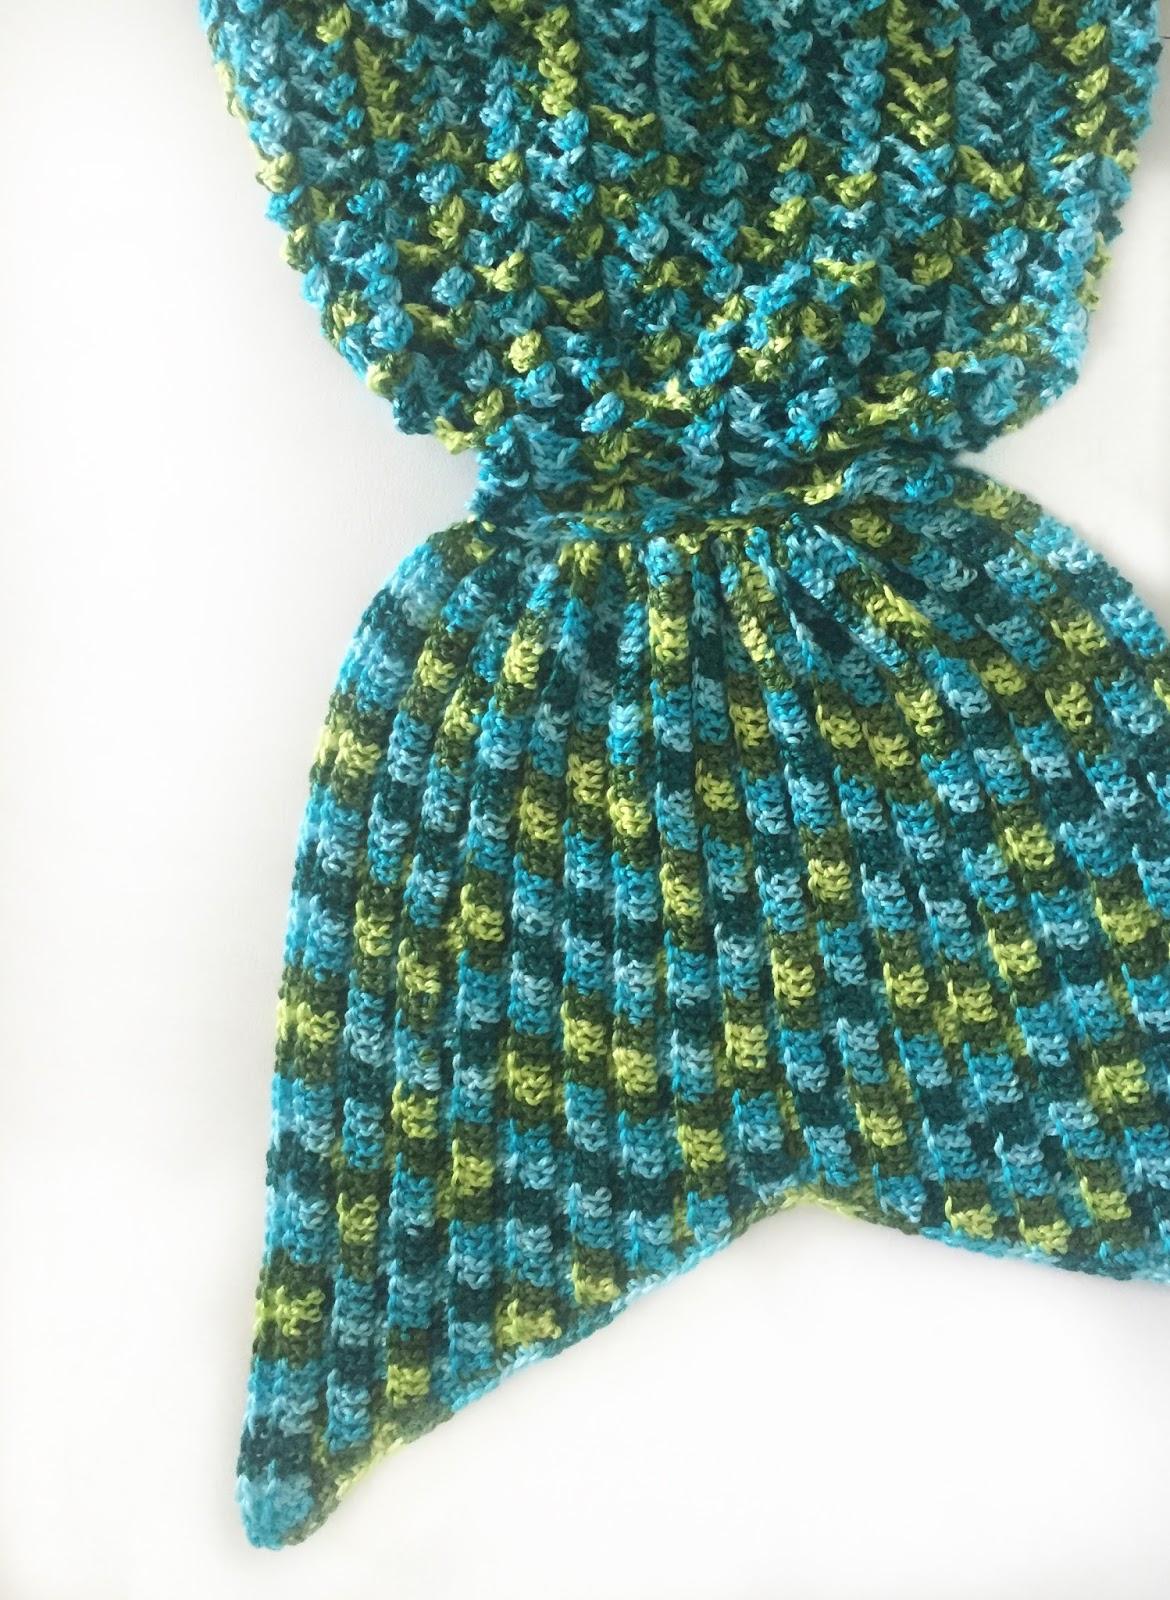 Crochet Mermaid Tail Daisy Farm Crafts